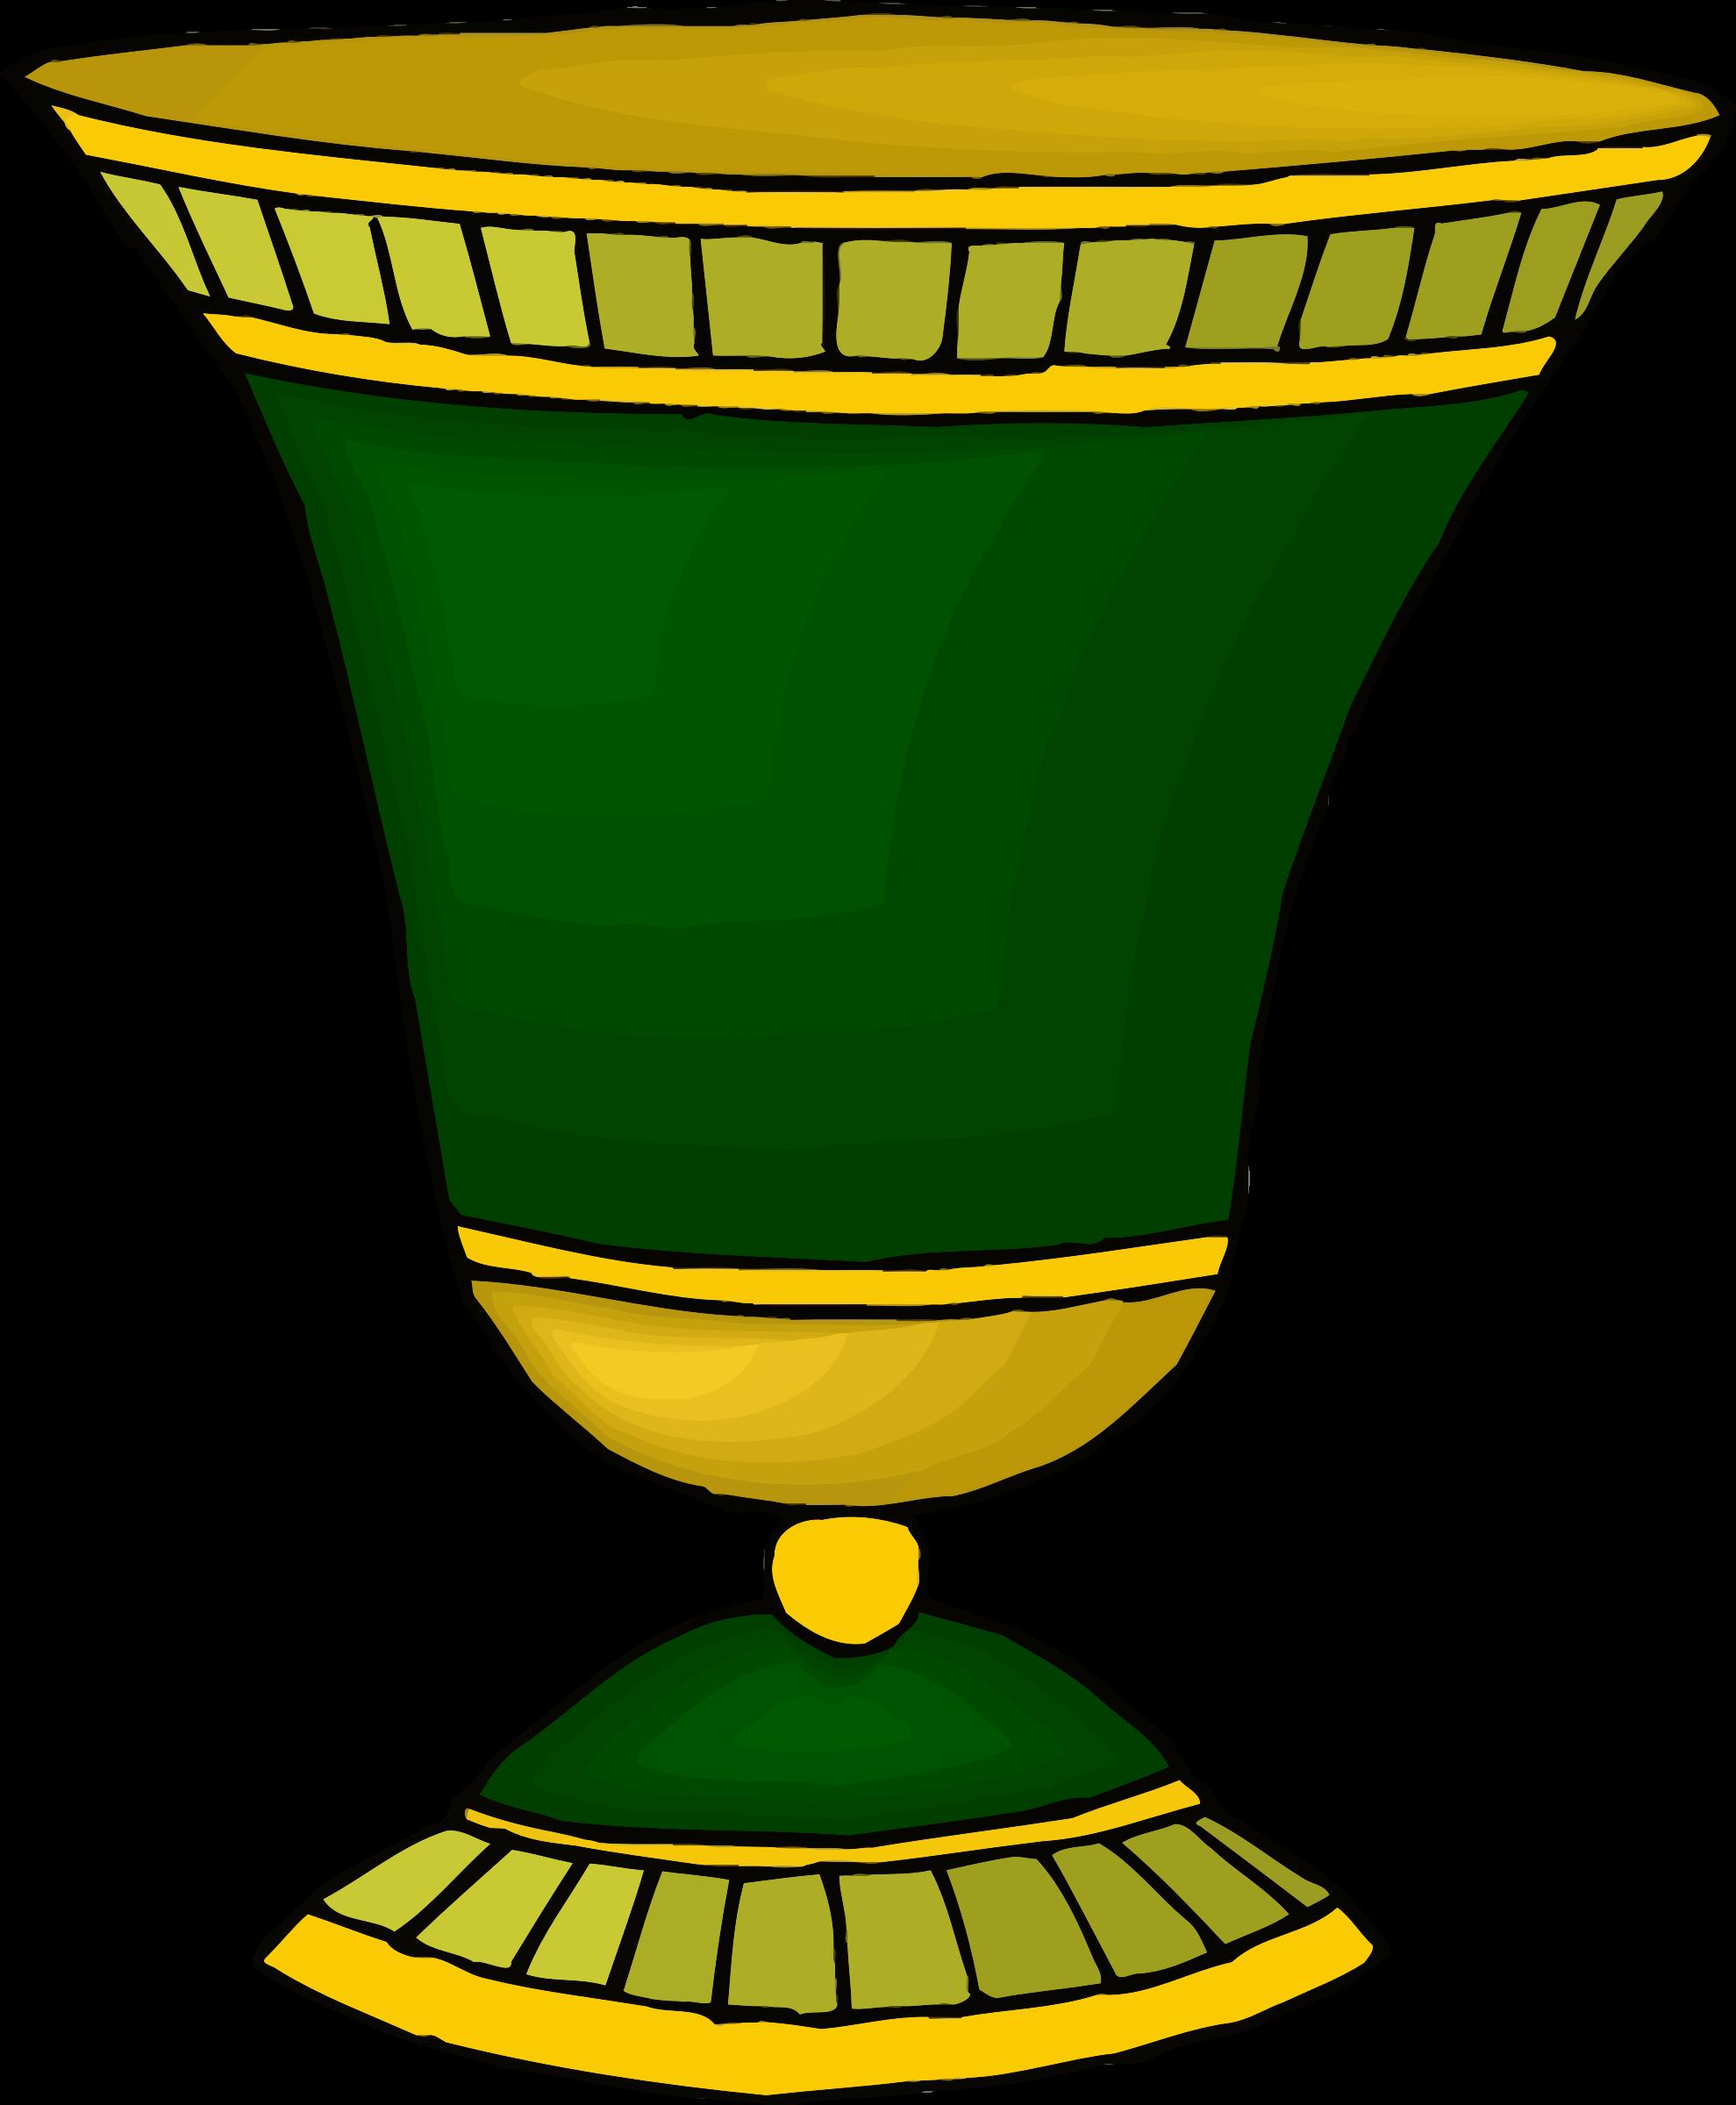 Vase clipart transparent 55 Vase Vase Clipart Firkin